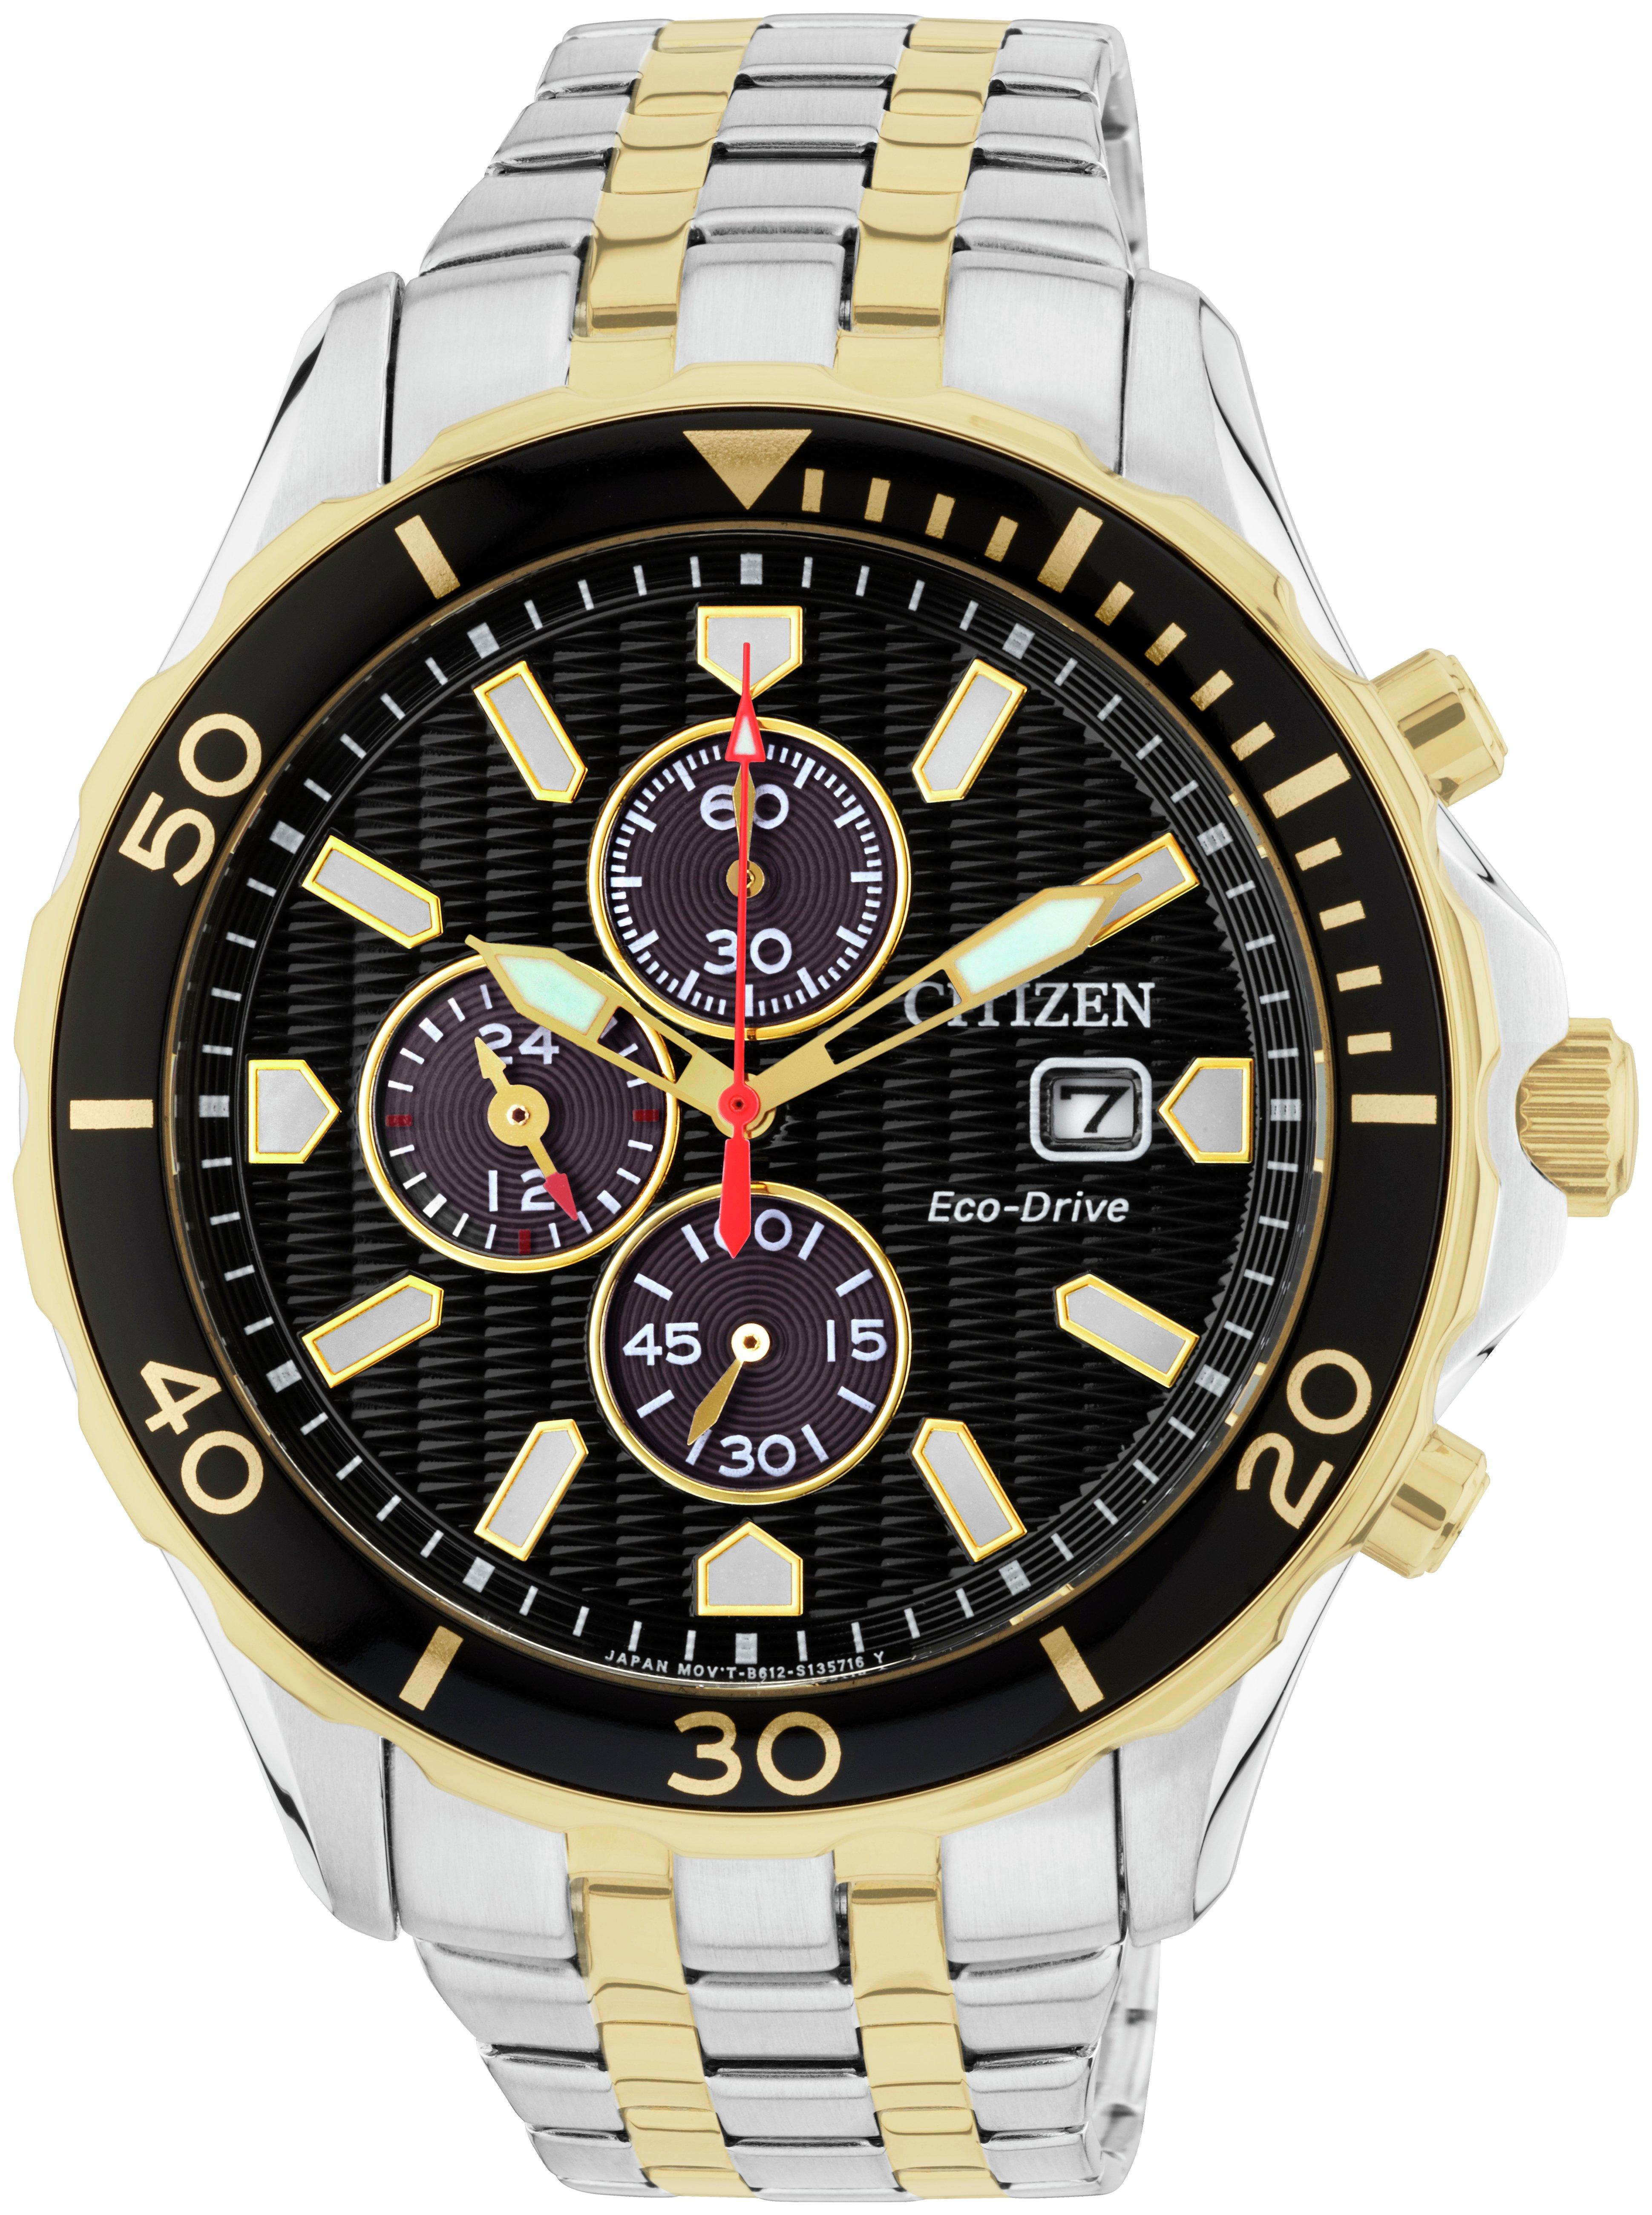 Citizen Eco-Drive Men's Two Tone Fixed Bezel Watch